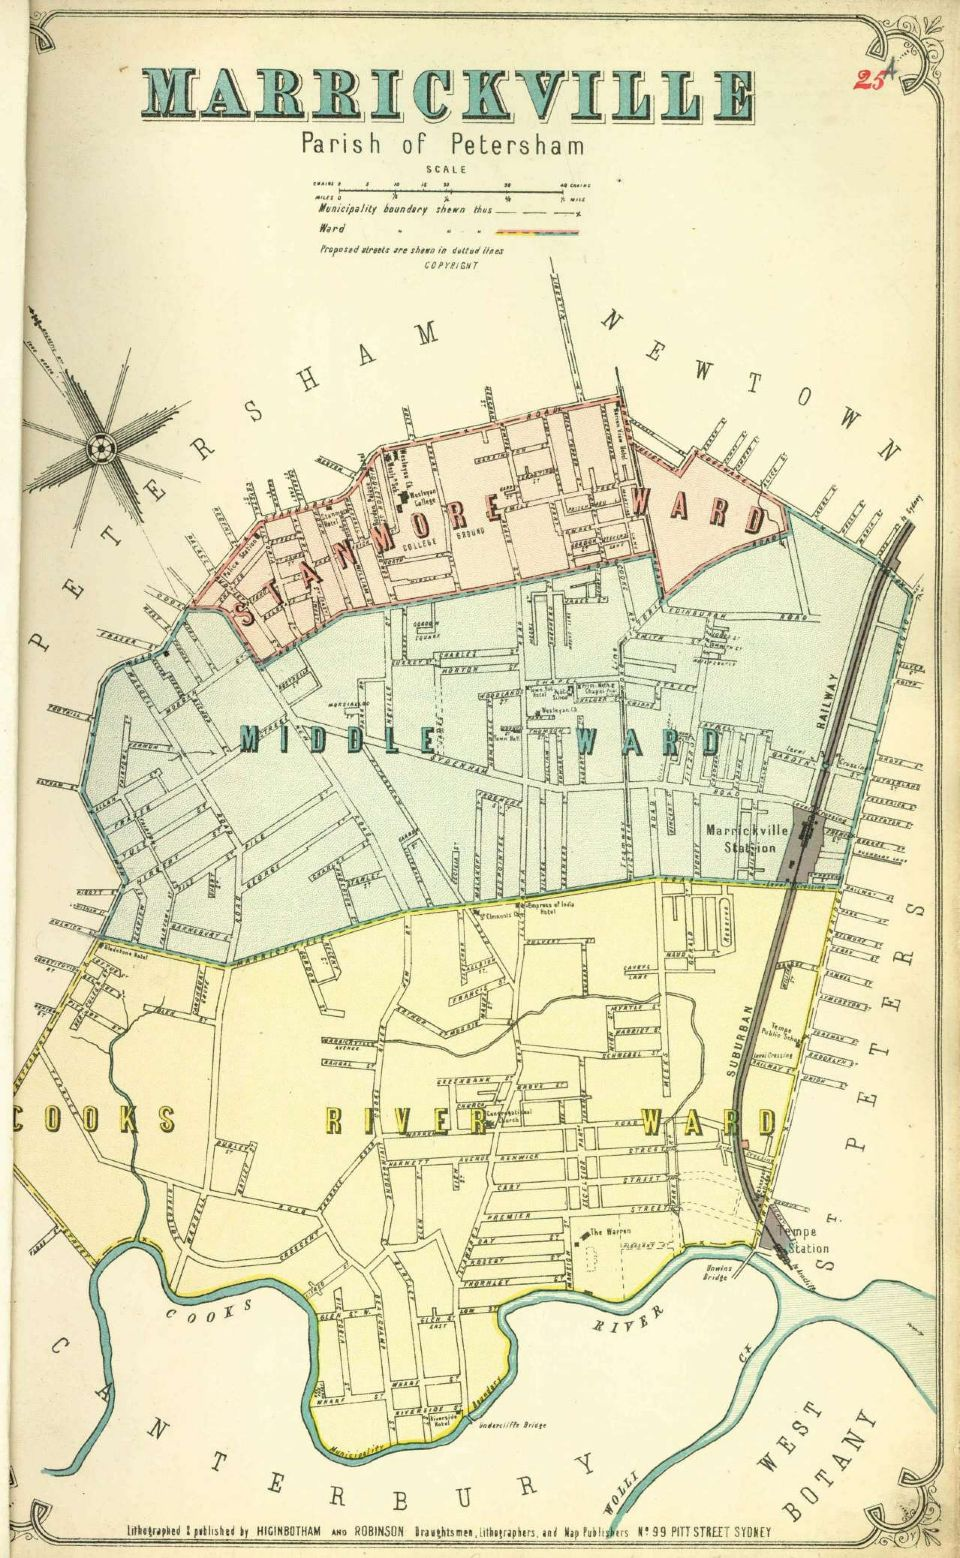 Atlas of the Suburbs of Sydney - Marrickville A 1886-1888 | The ...